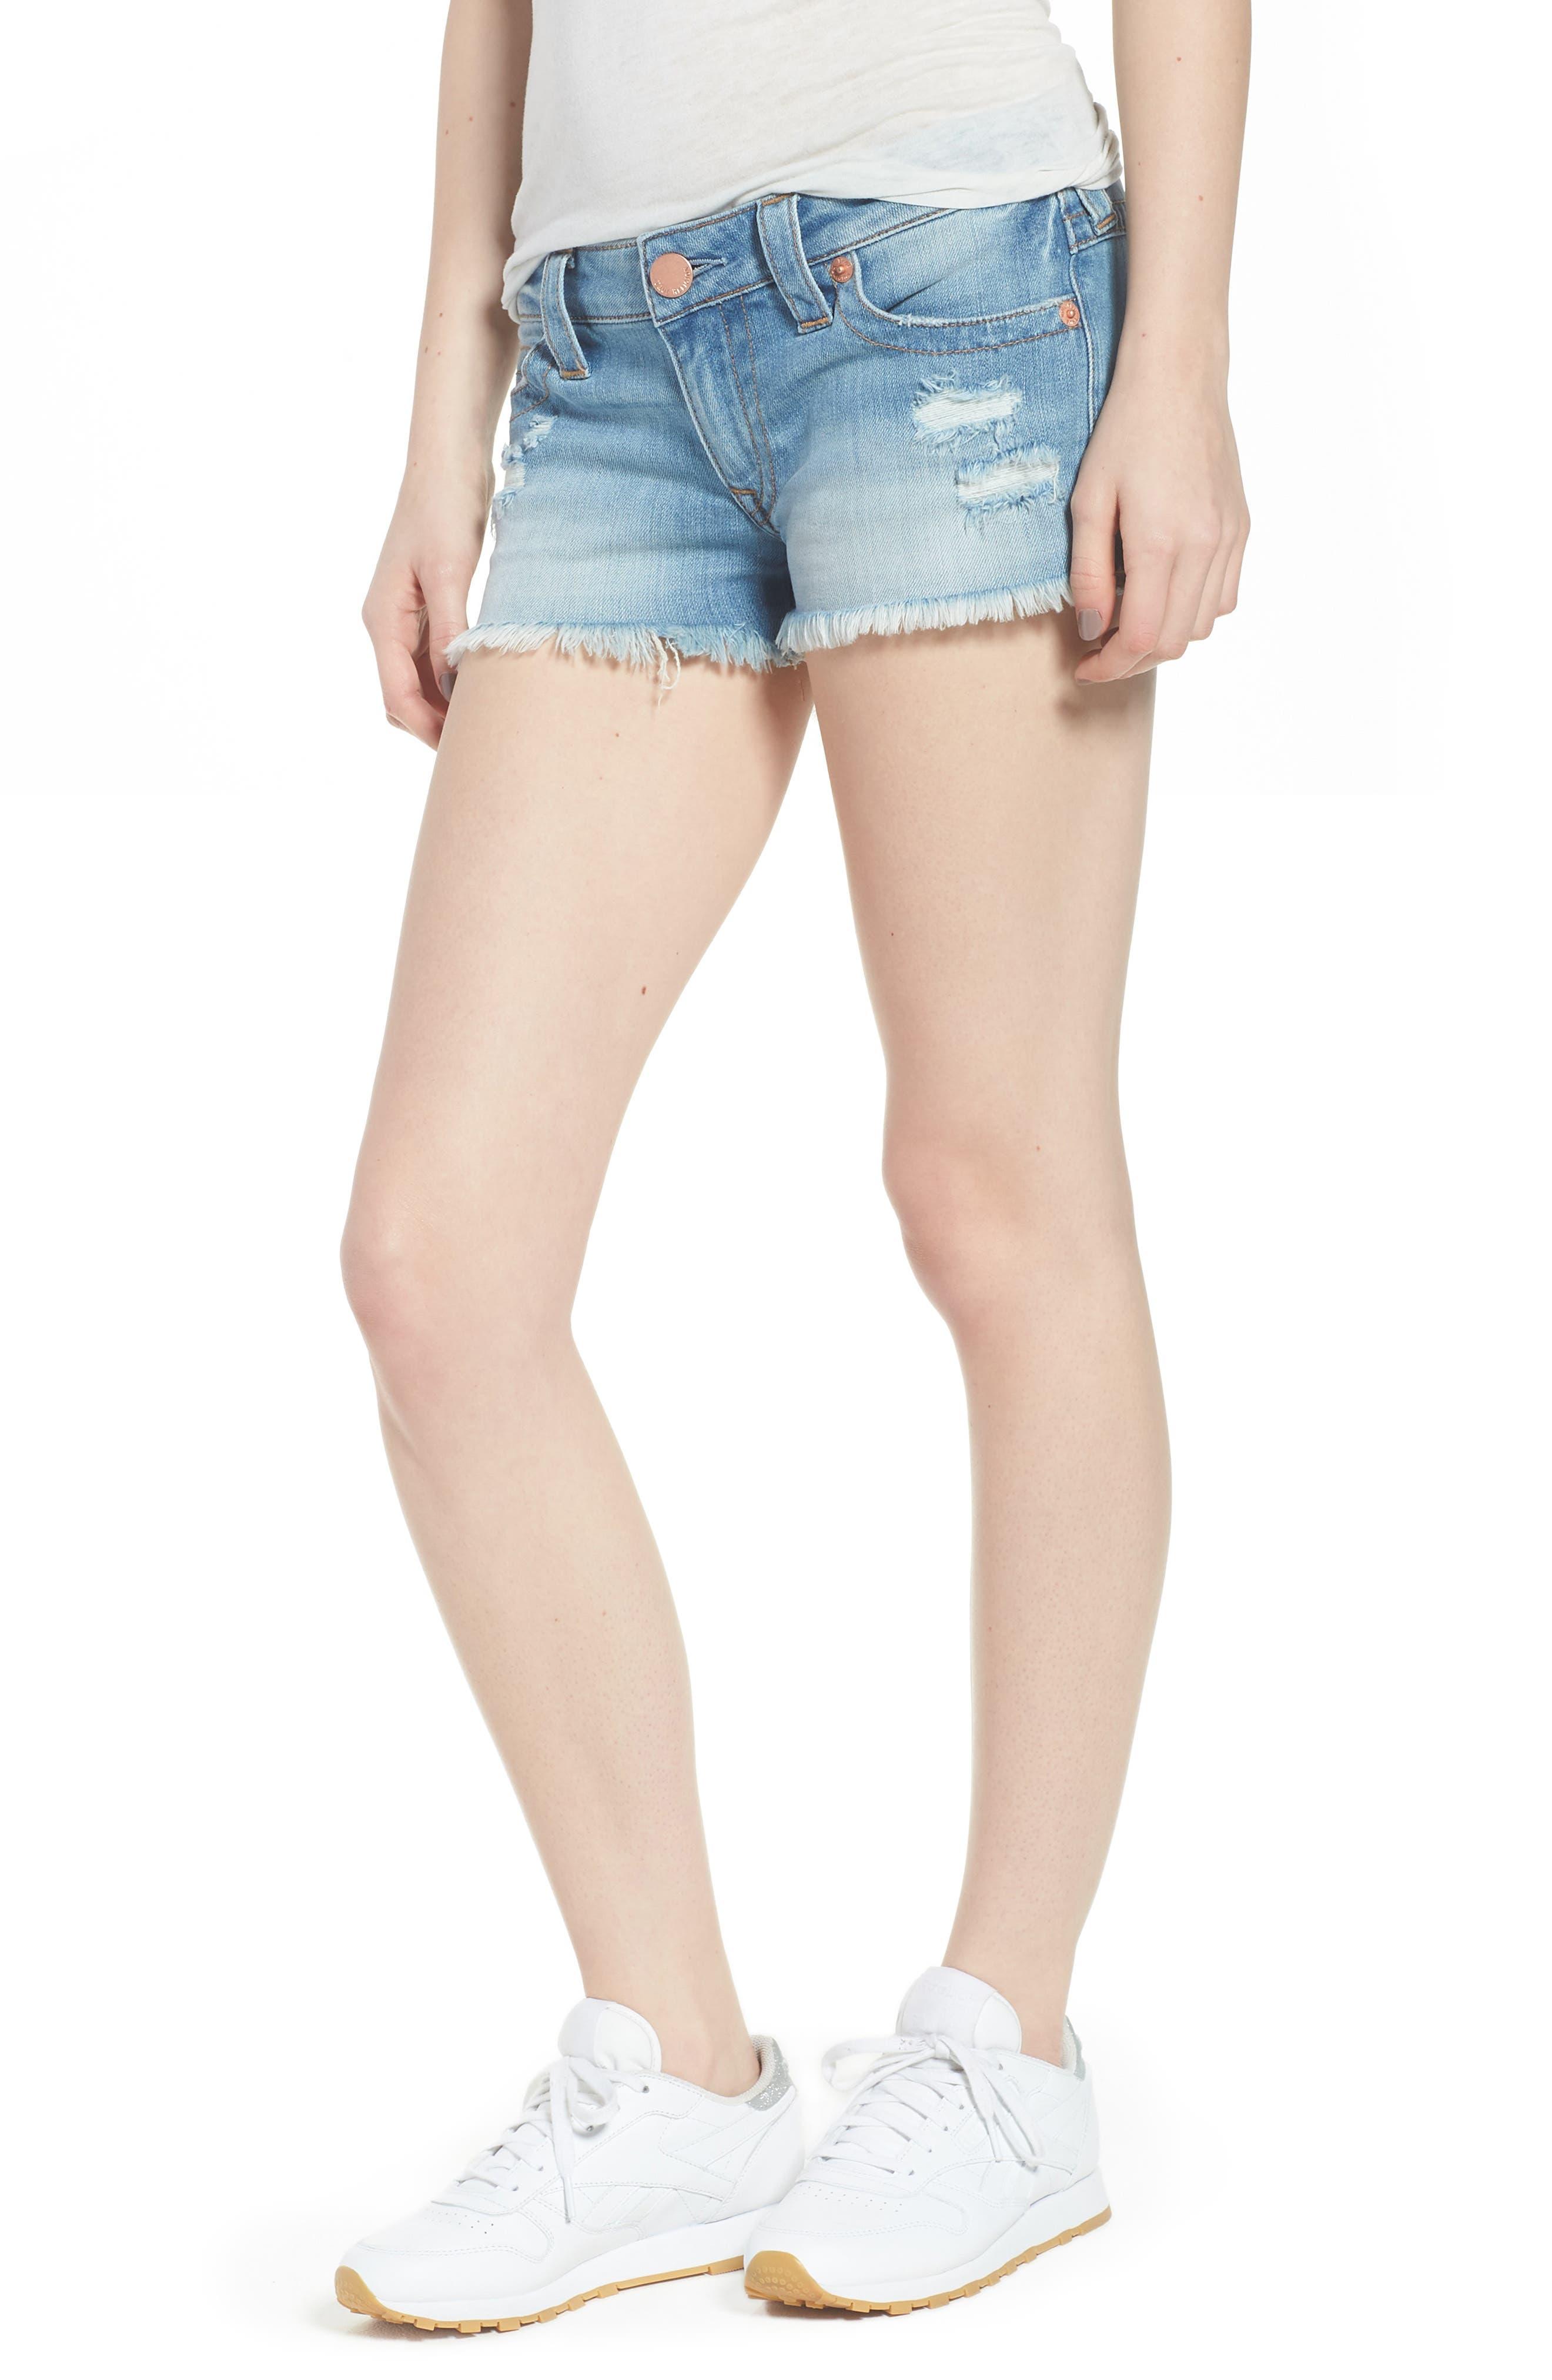 True Religion Brand Jeans Joey Flap Pocket Cutoff Denim Shorts (Third Quarter)